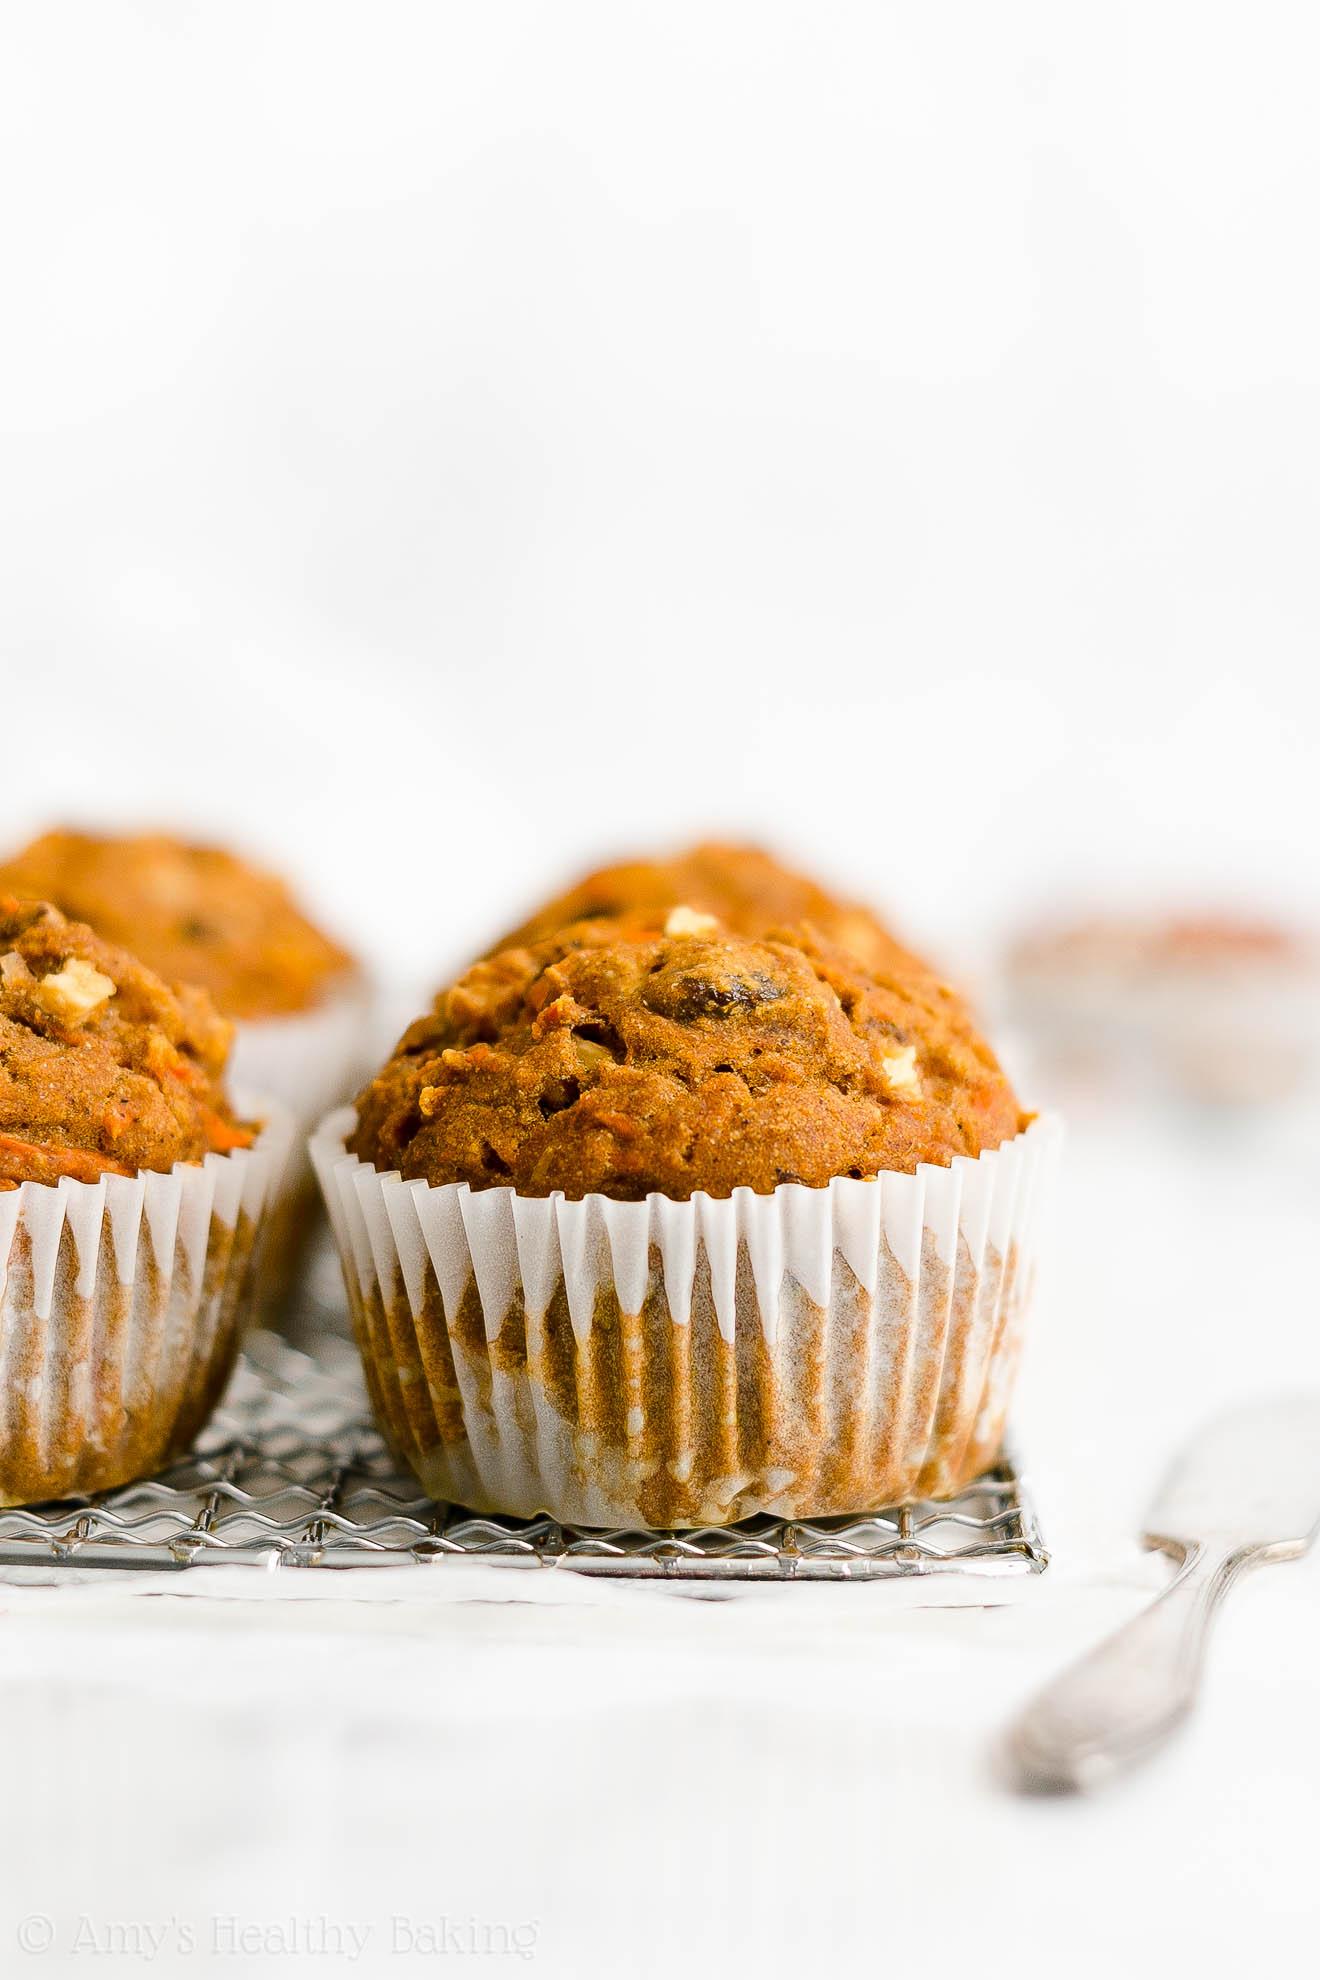 Best Easy Healthy Moist Low Sugar Greek Yogurt Pumpkin Morning Glory Muffins